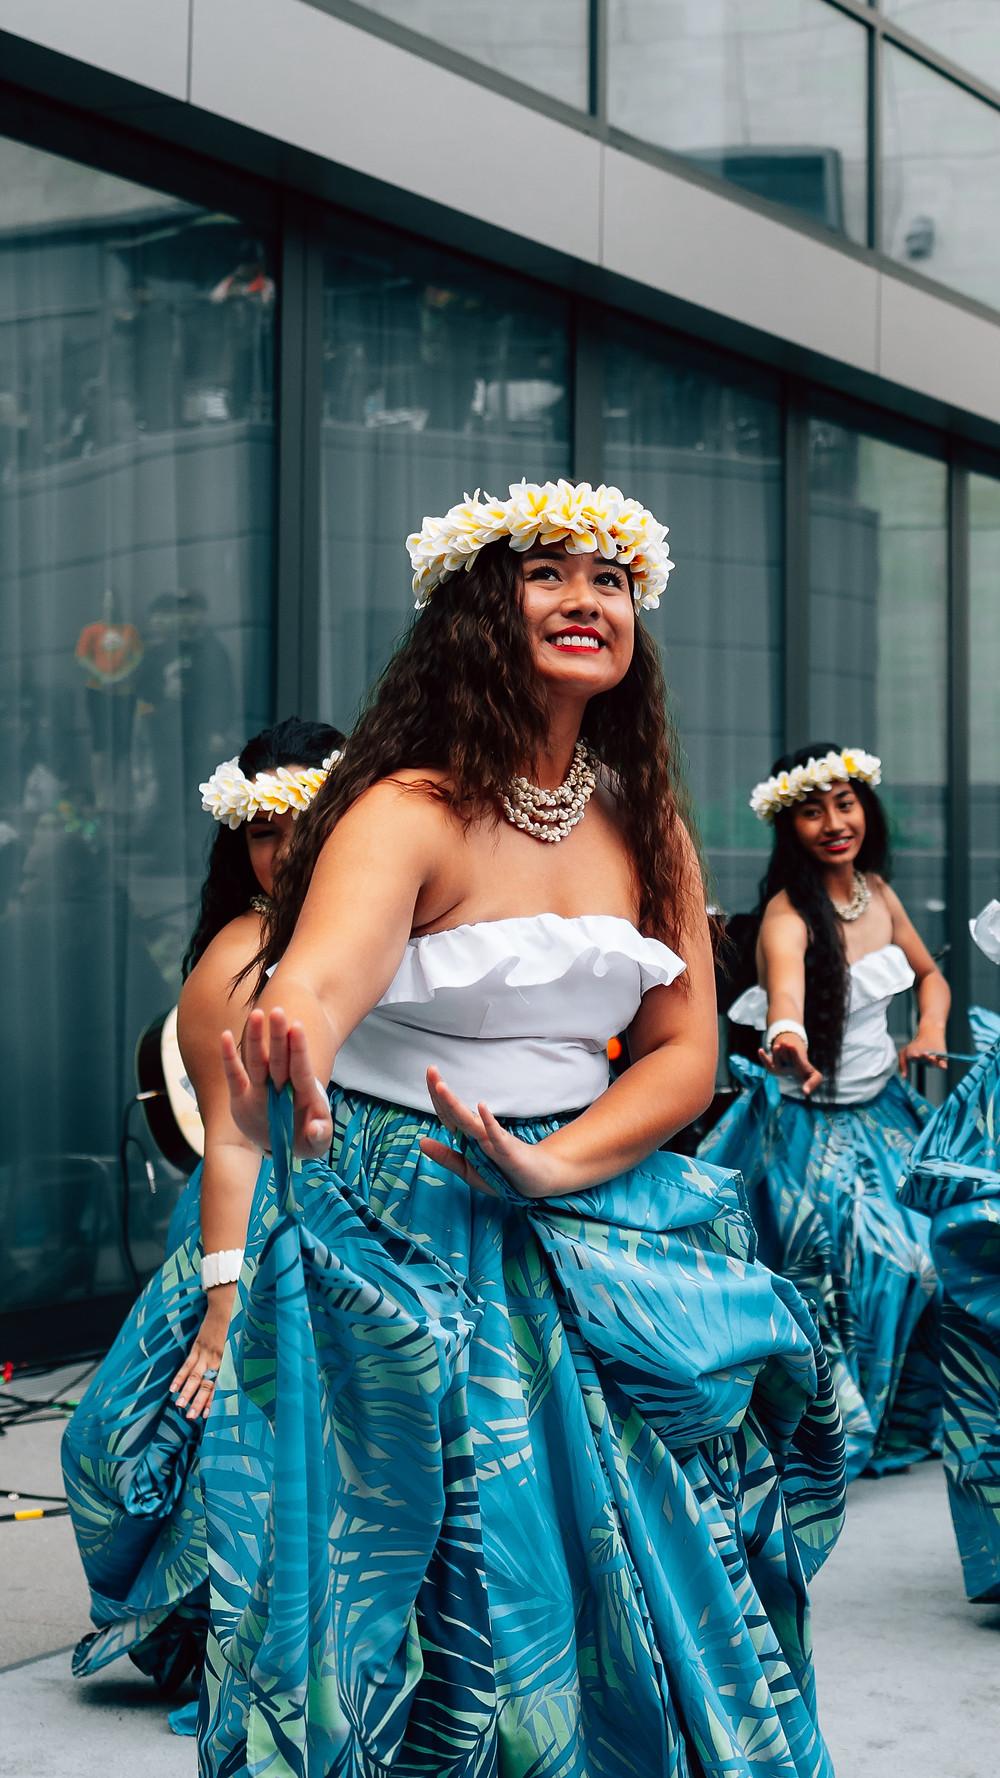 A Hawaiian woman dancing the hula